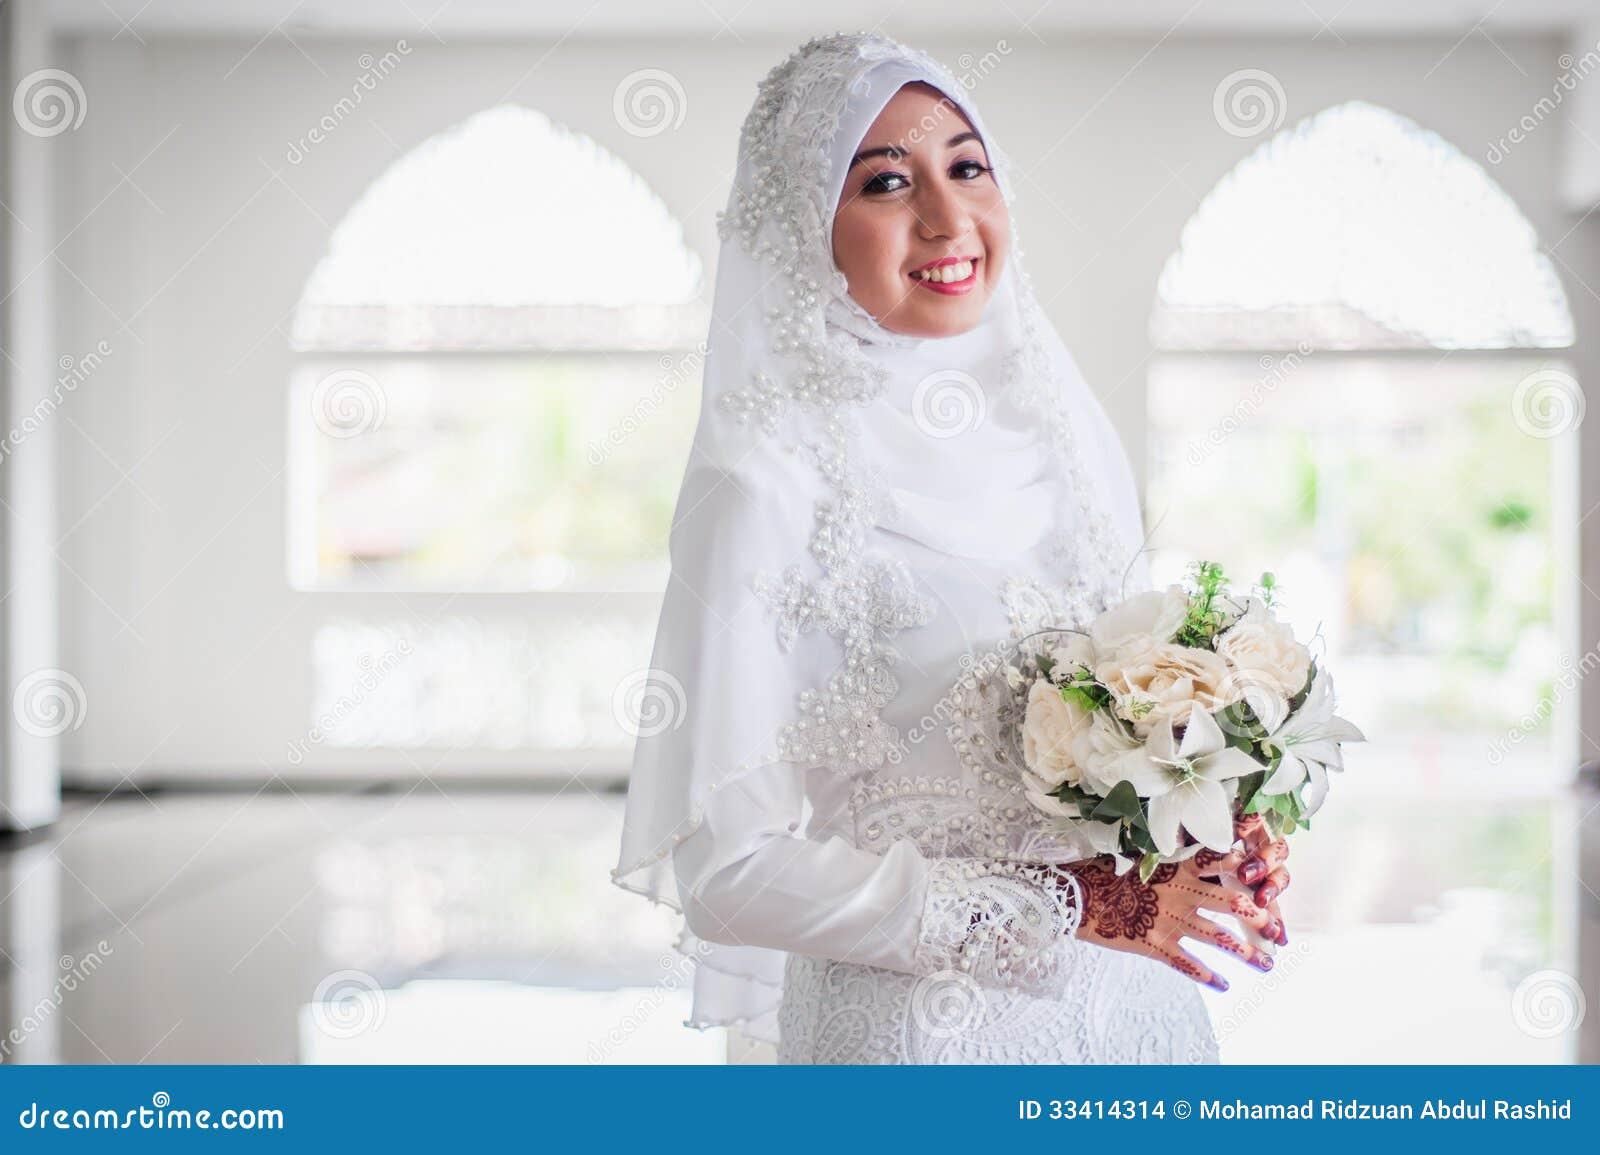 The Bride stock photo. Image of bride, woman, outdoor - 33414314